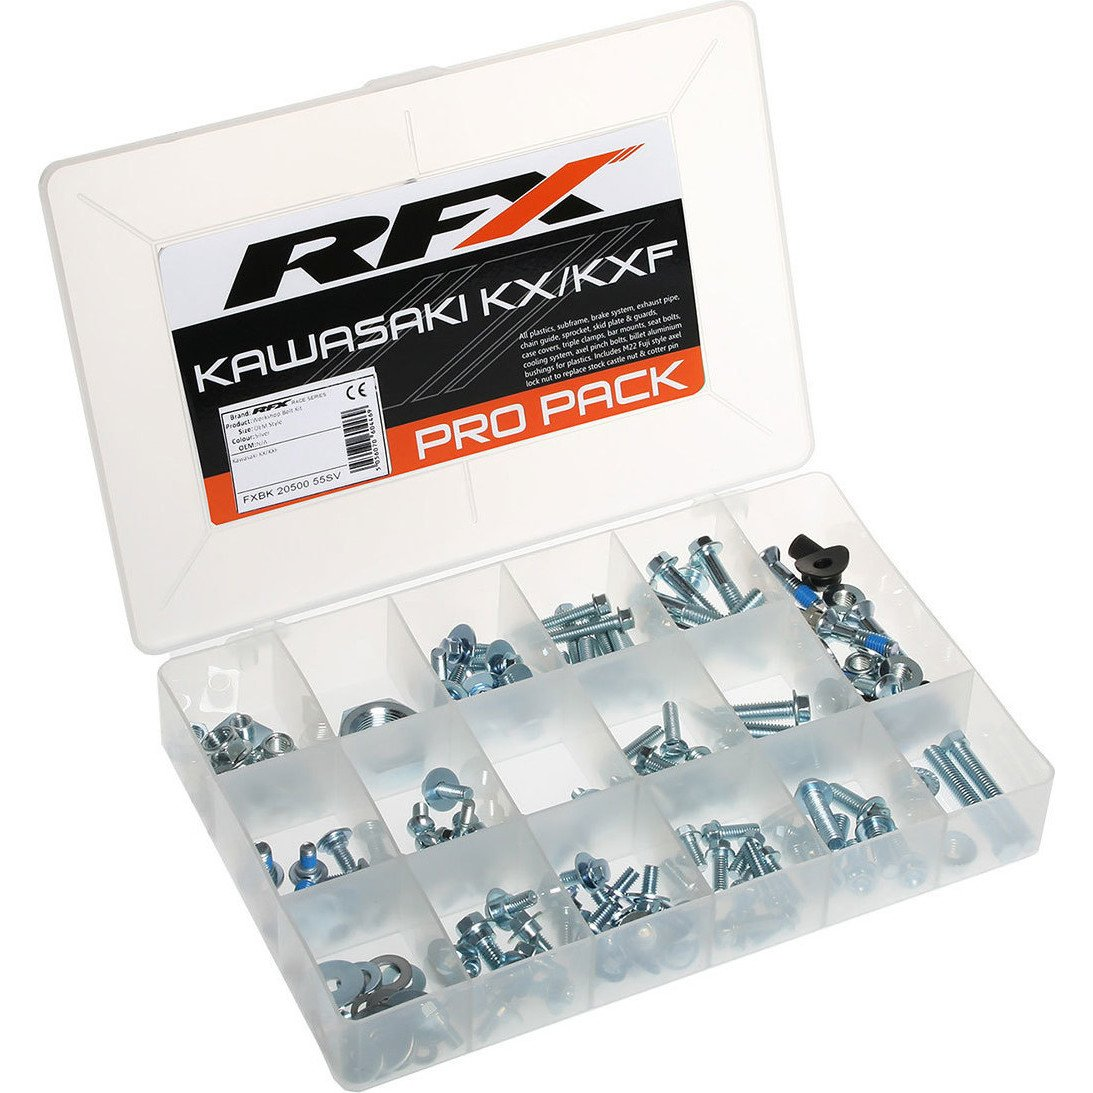 Rfx Fxbk 20500 55SV workshop Bolt kit OEM Style per Kawasaki KX/Kxf FXBK 20500 55SV